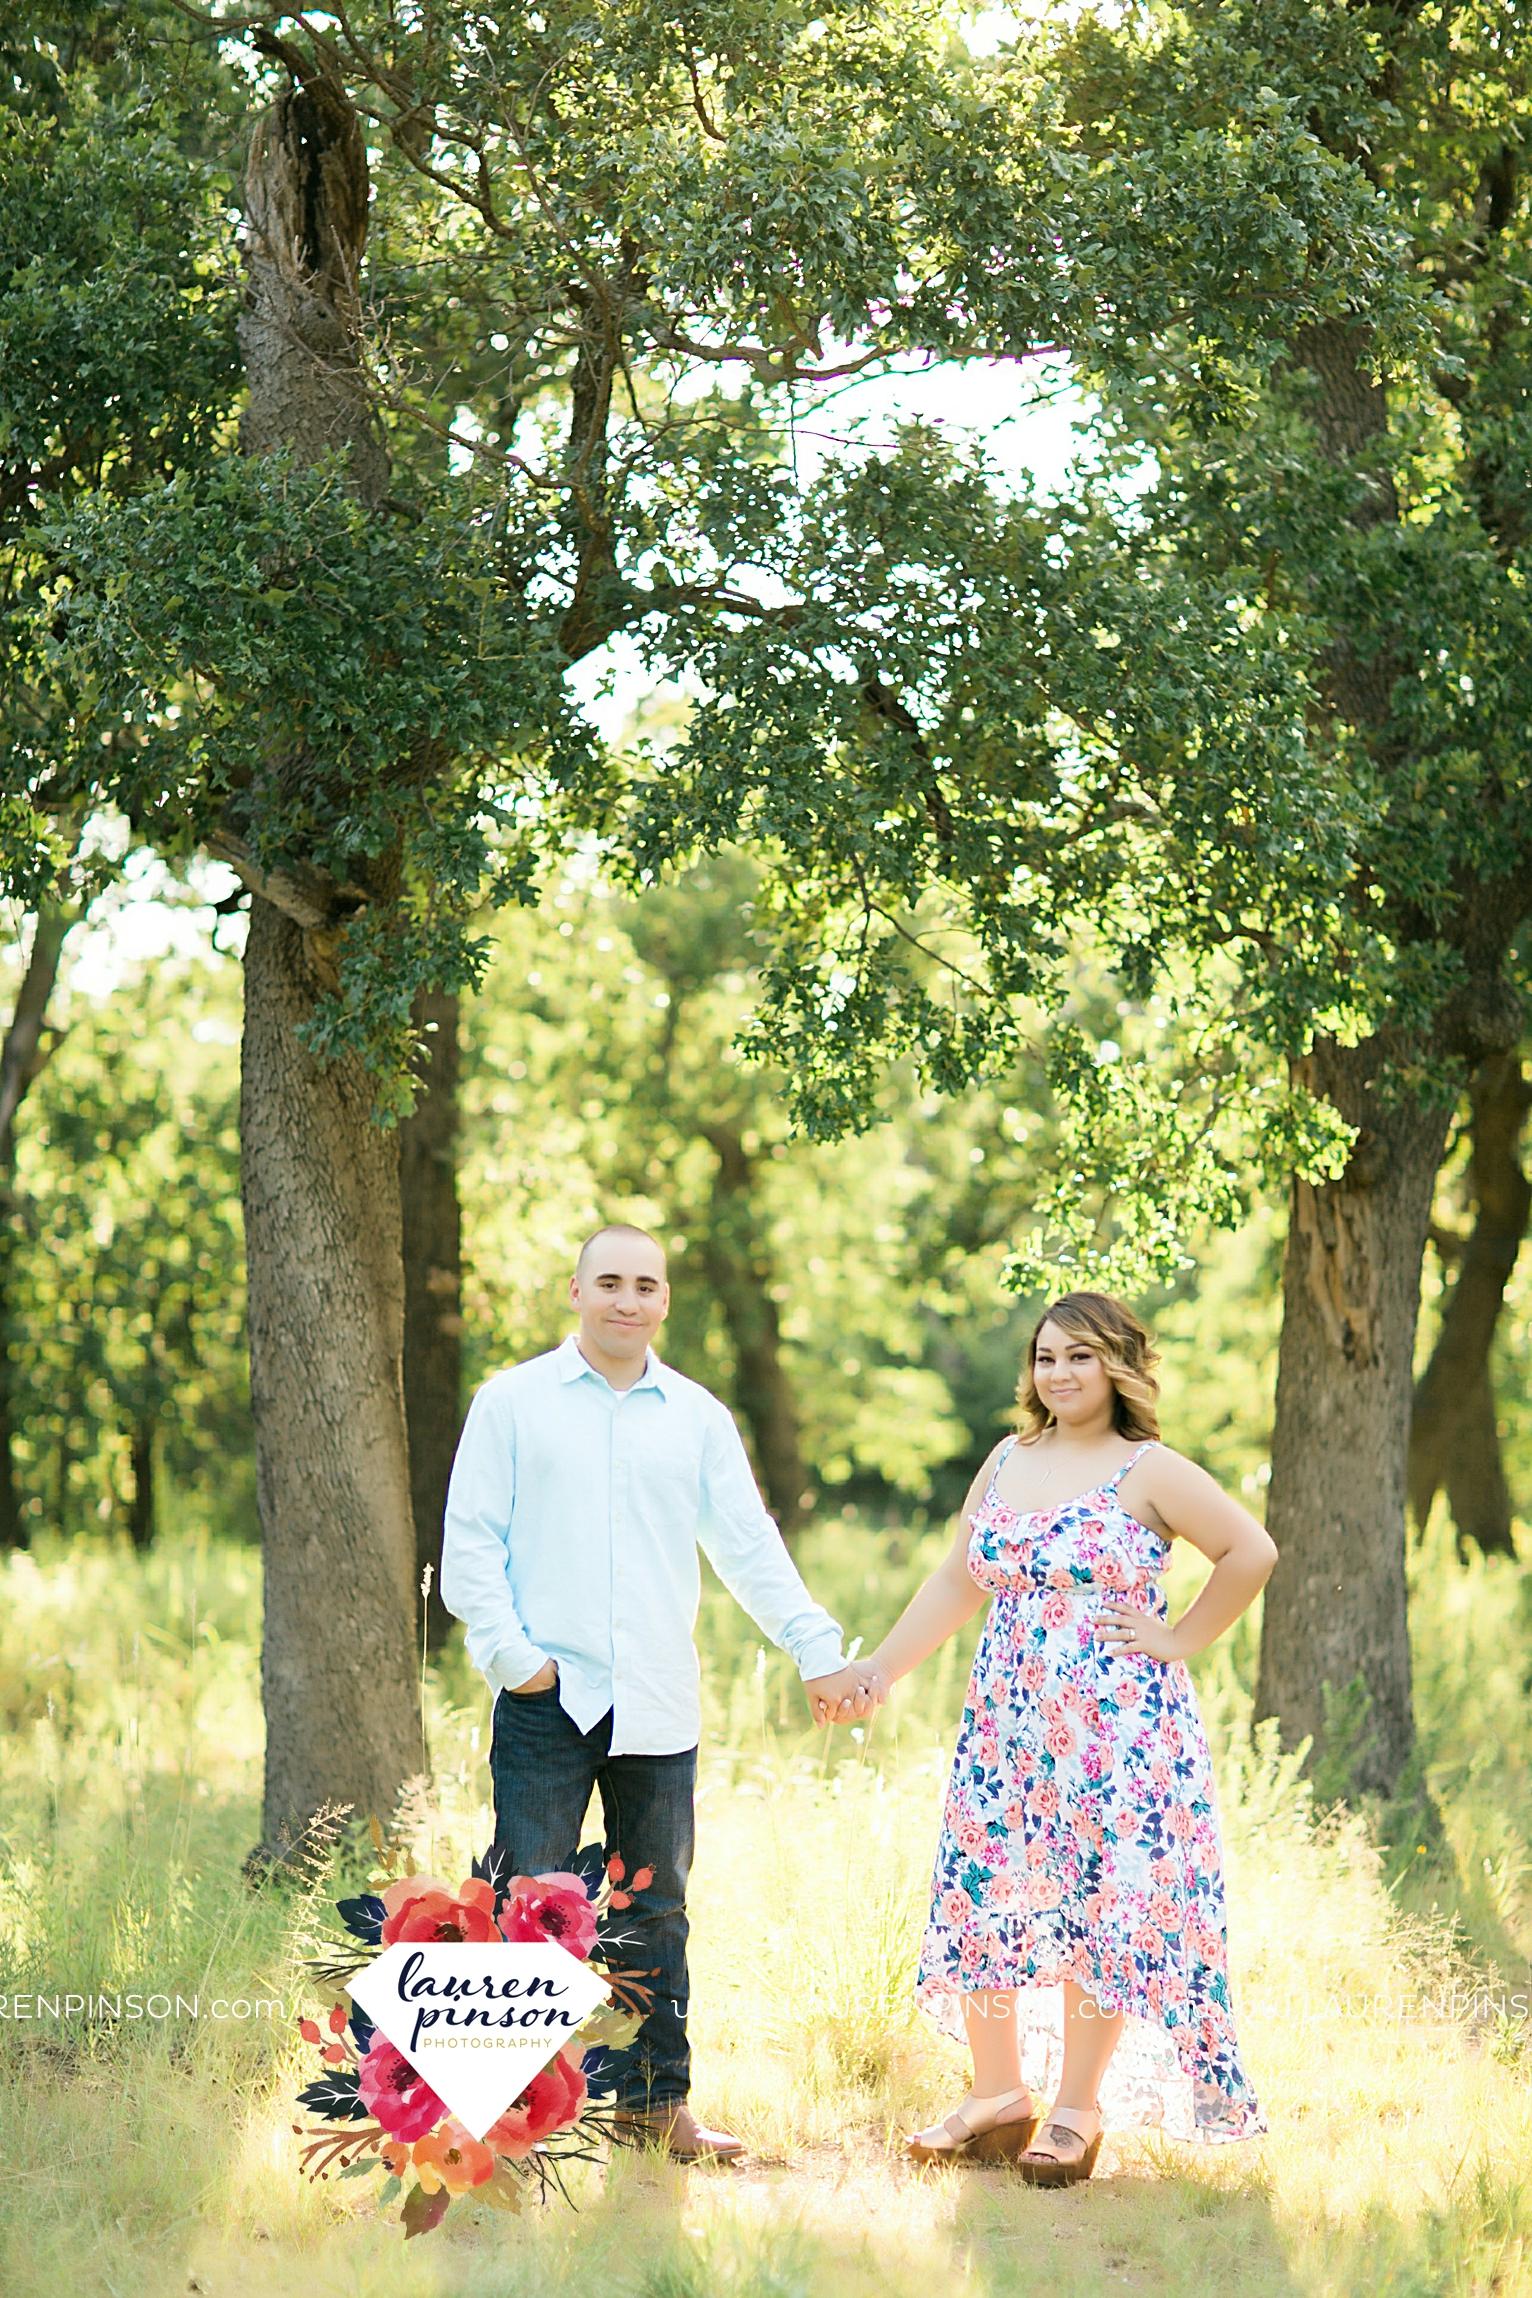 wichita-falls-texas-wedding-photography-engagement-session-army-fort-sill-lawton-oklahoma-wichita-mountains-newlyweds-00004.jpg